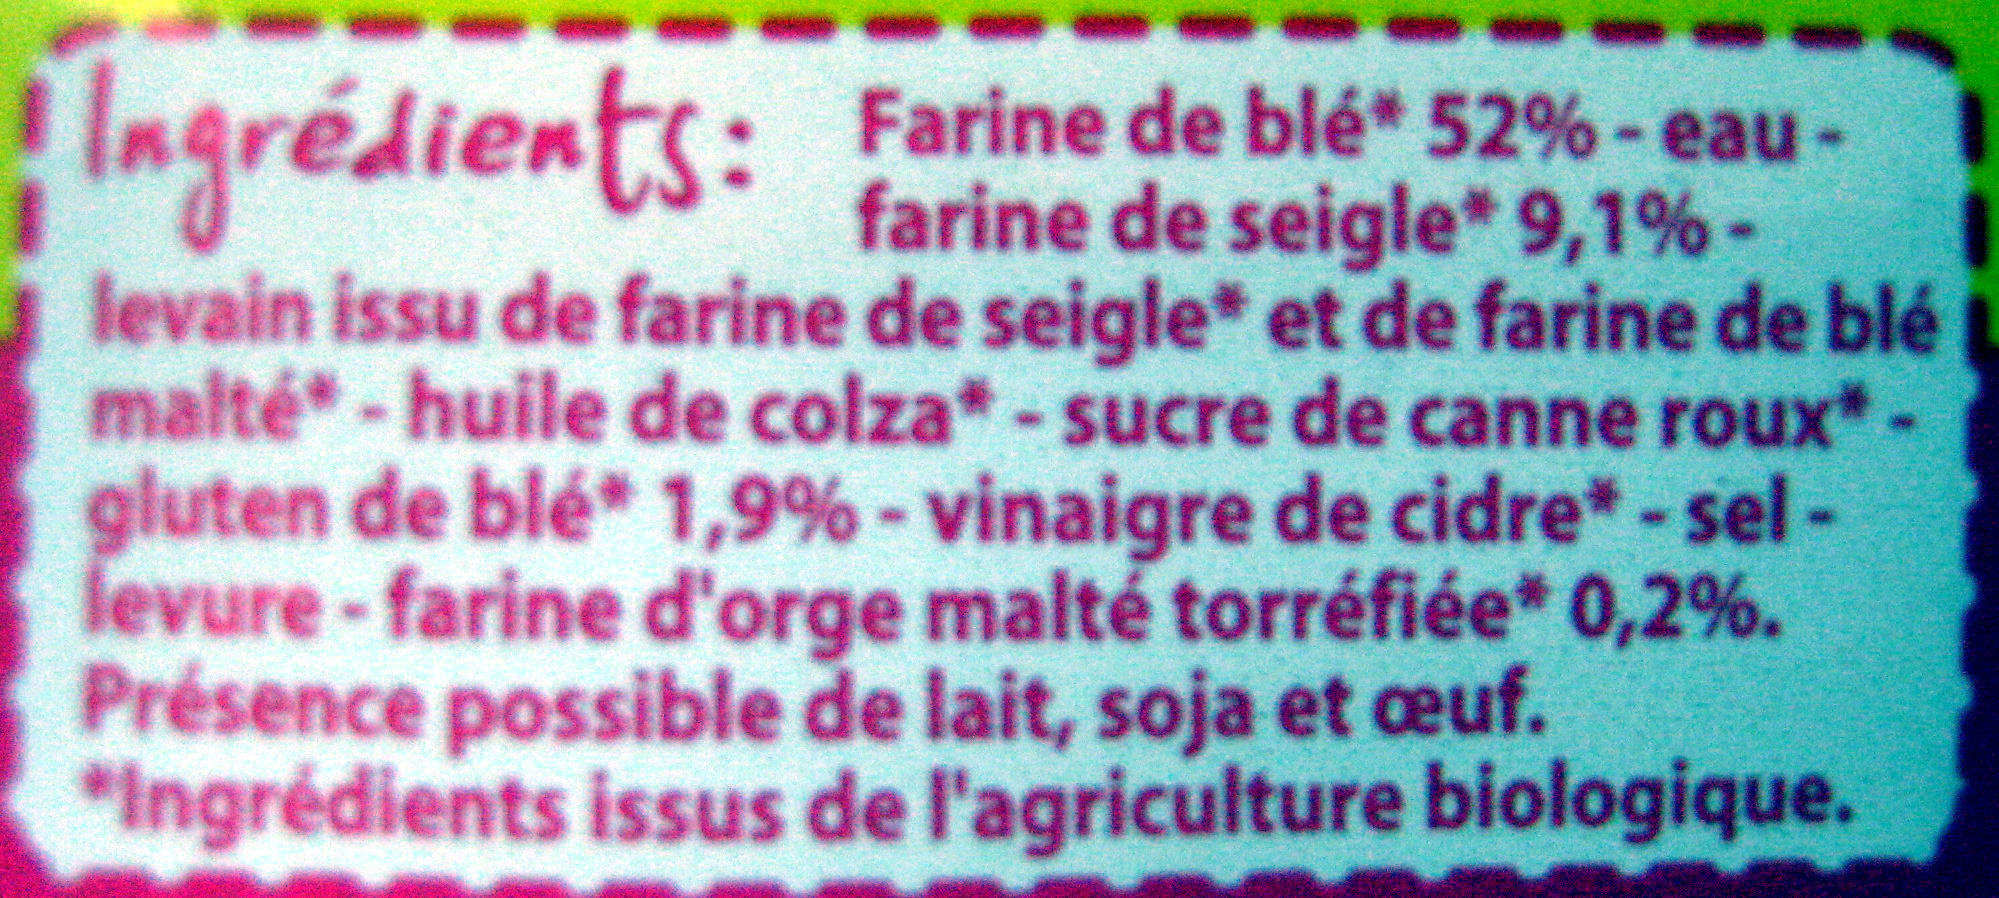 Pain spécial de Campagne Bio - Ingrediënten - fr